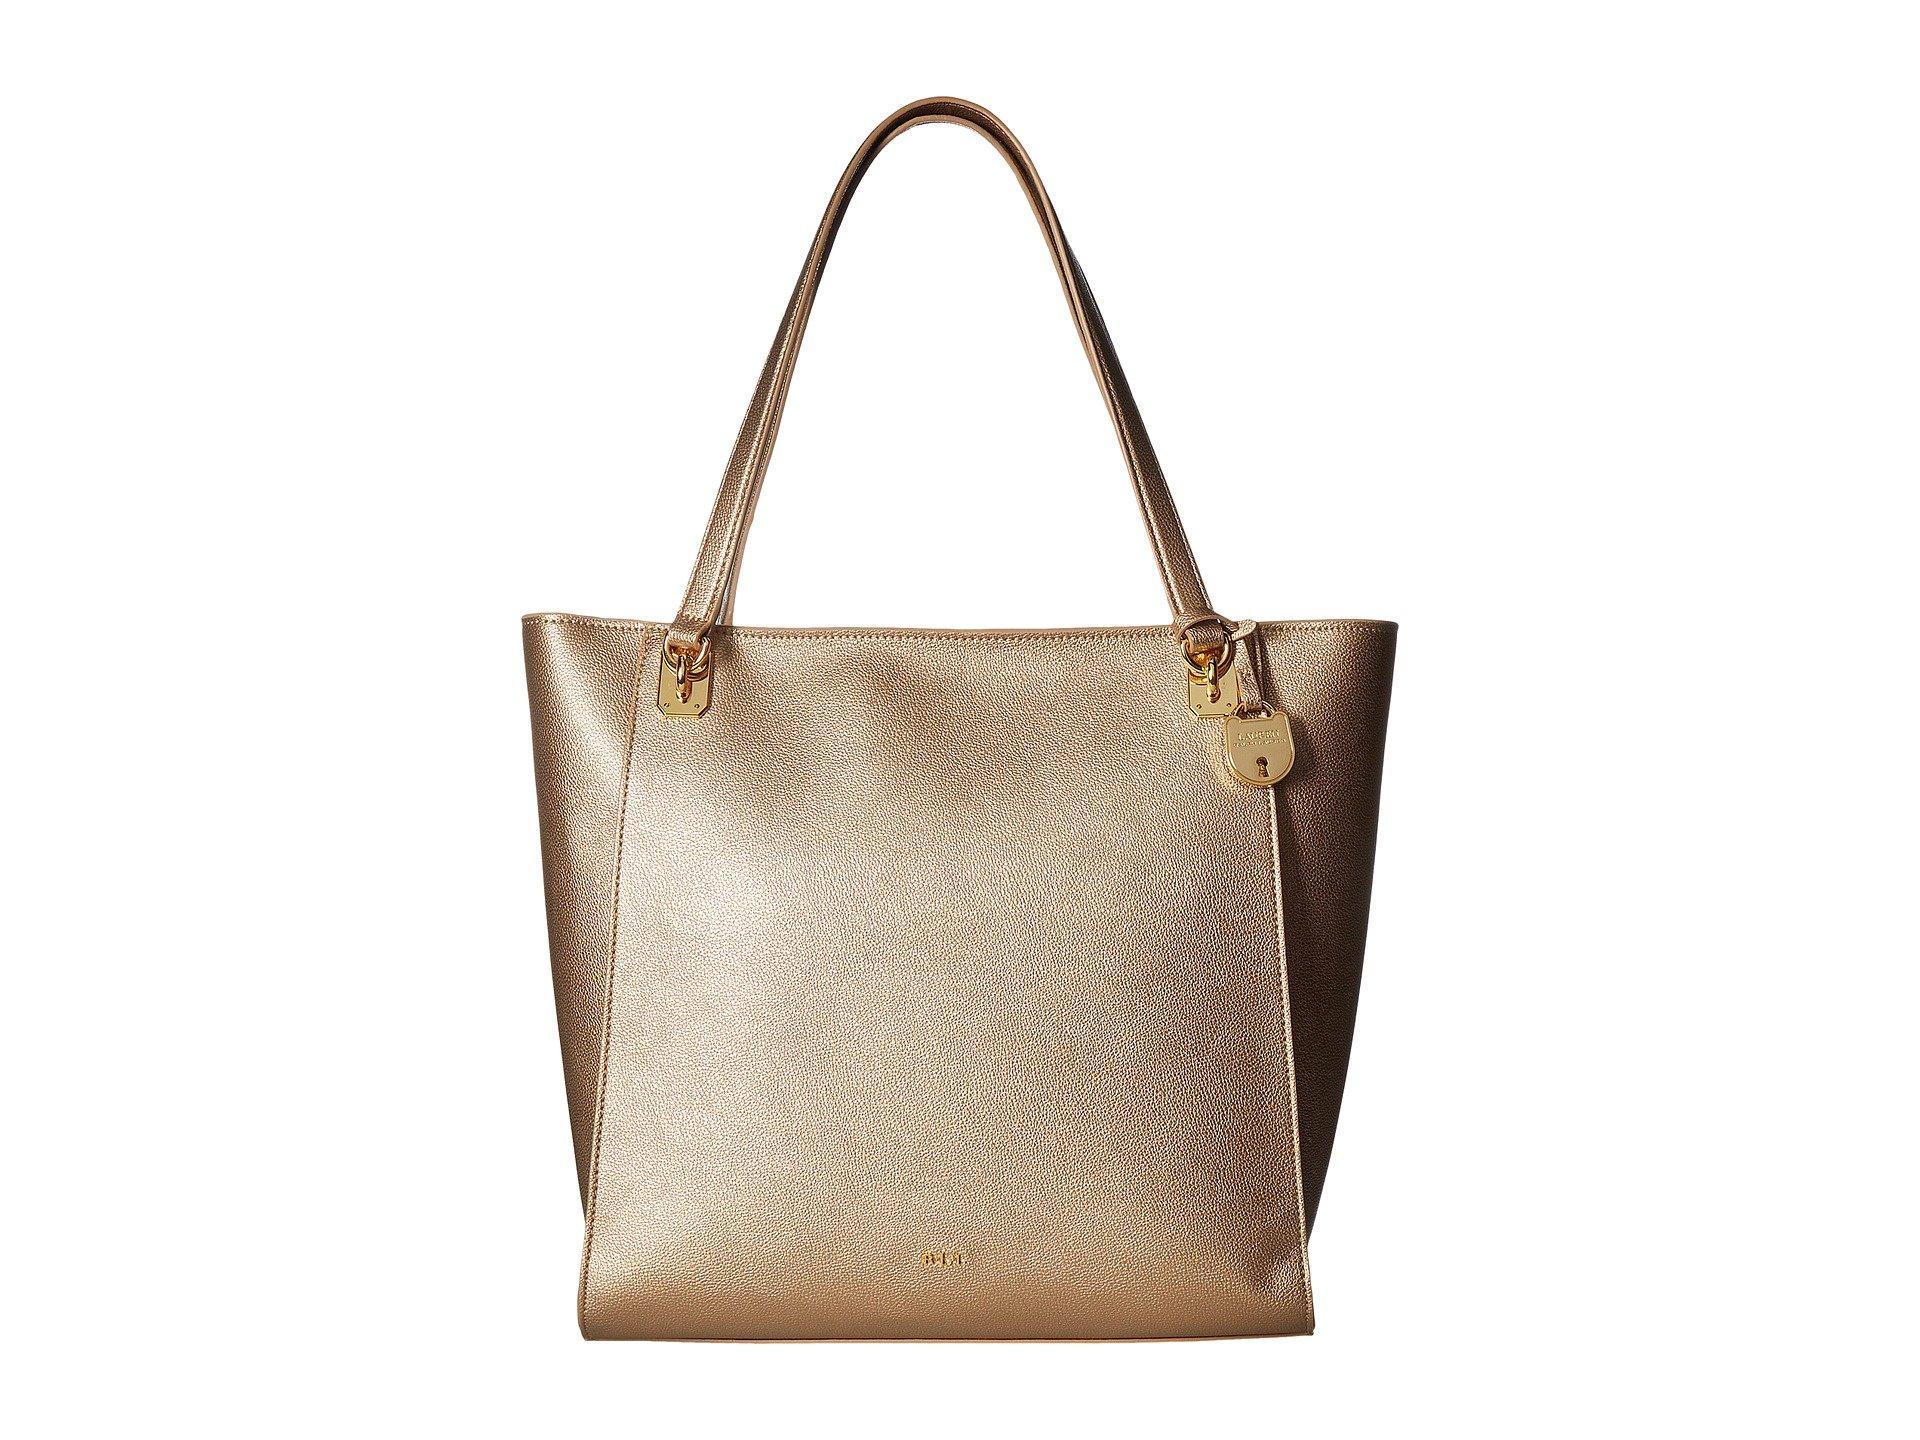 1a6e430bd8 ... shop lauren ralph lauren emden elizabeth tote in gold leaf 4c309 5abcf